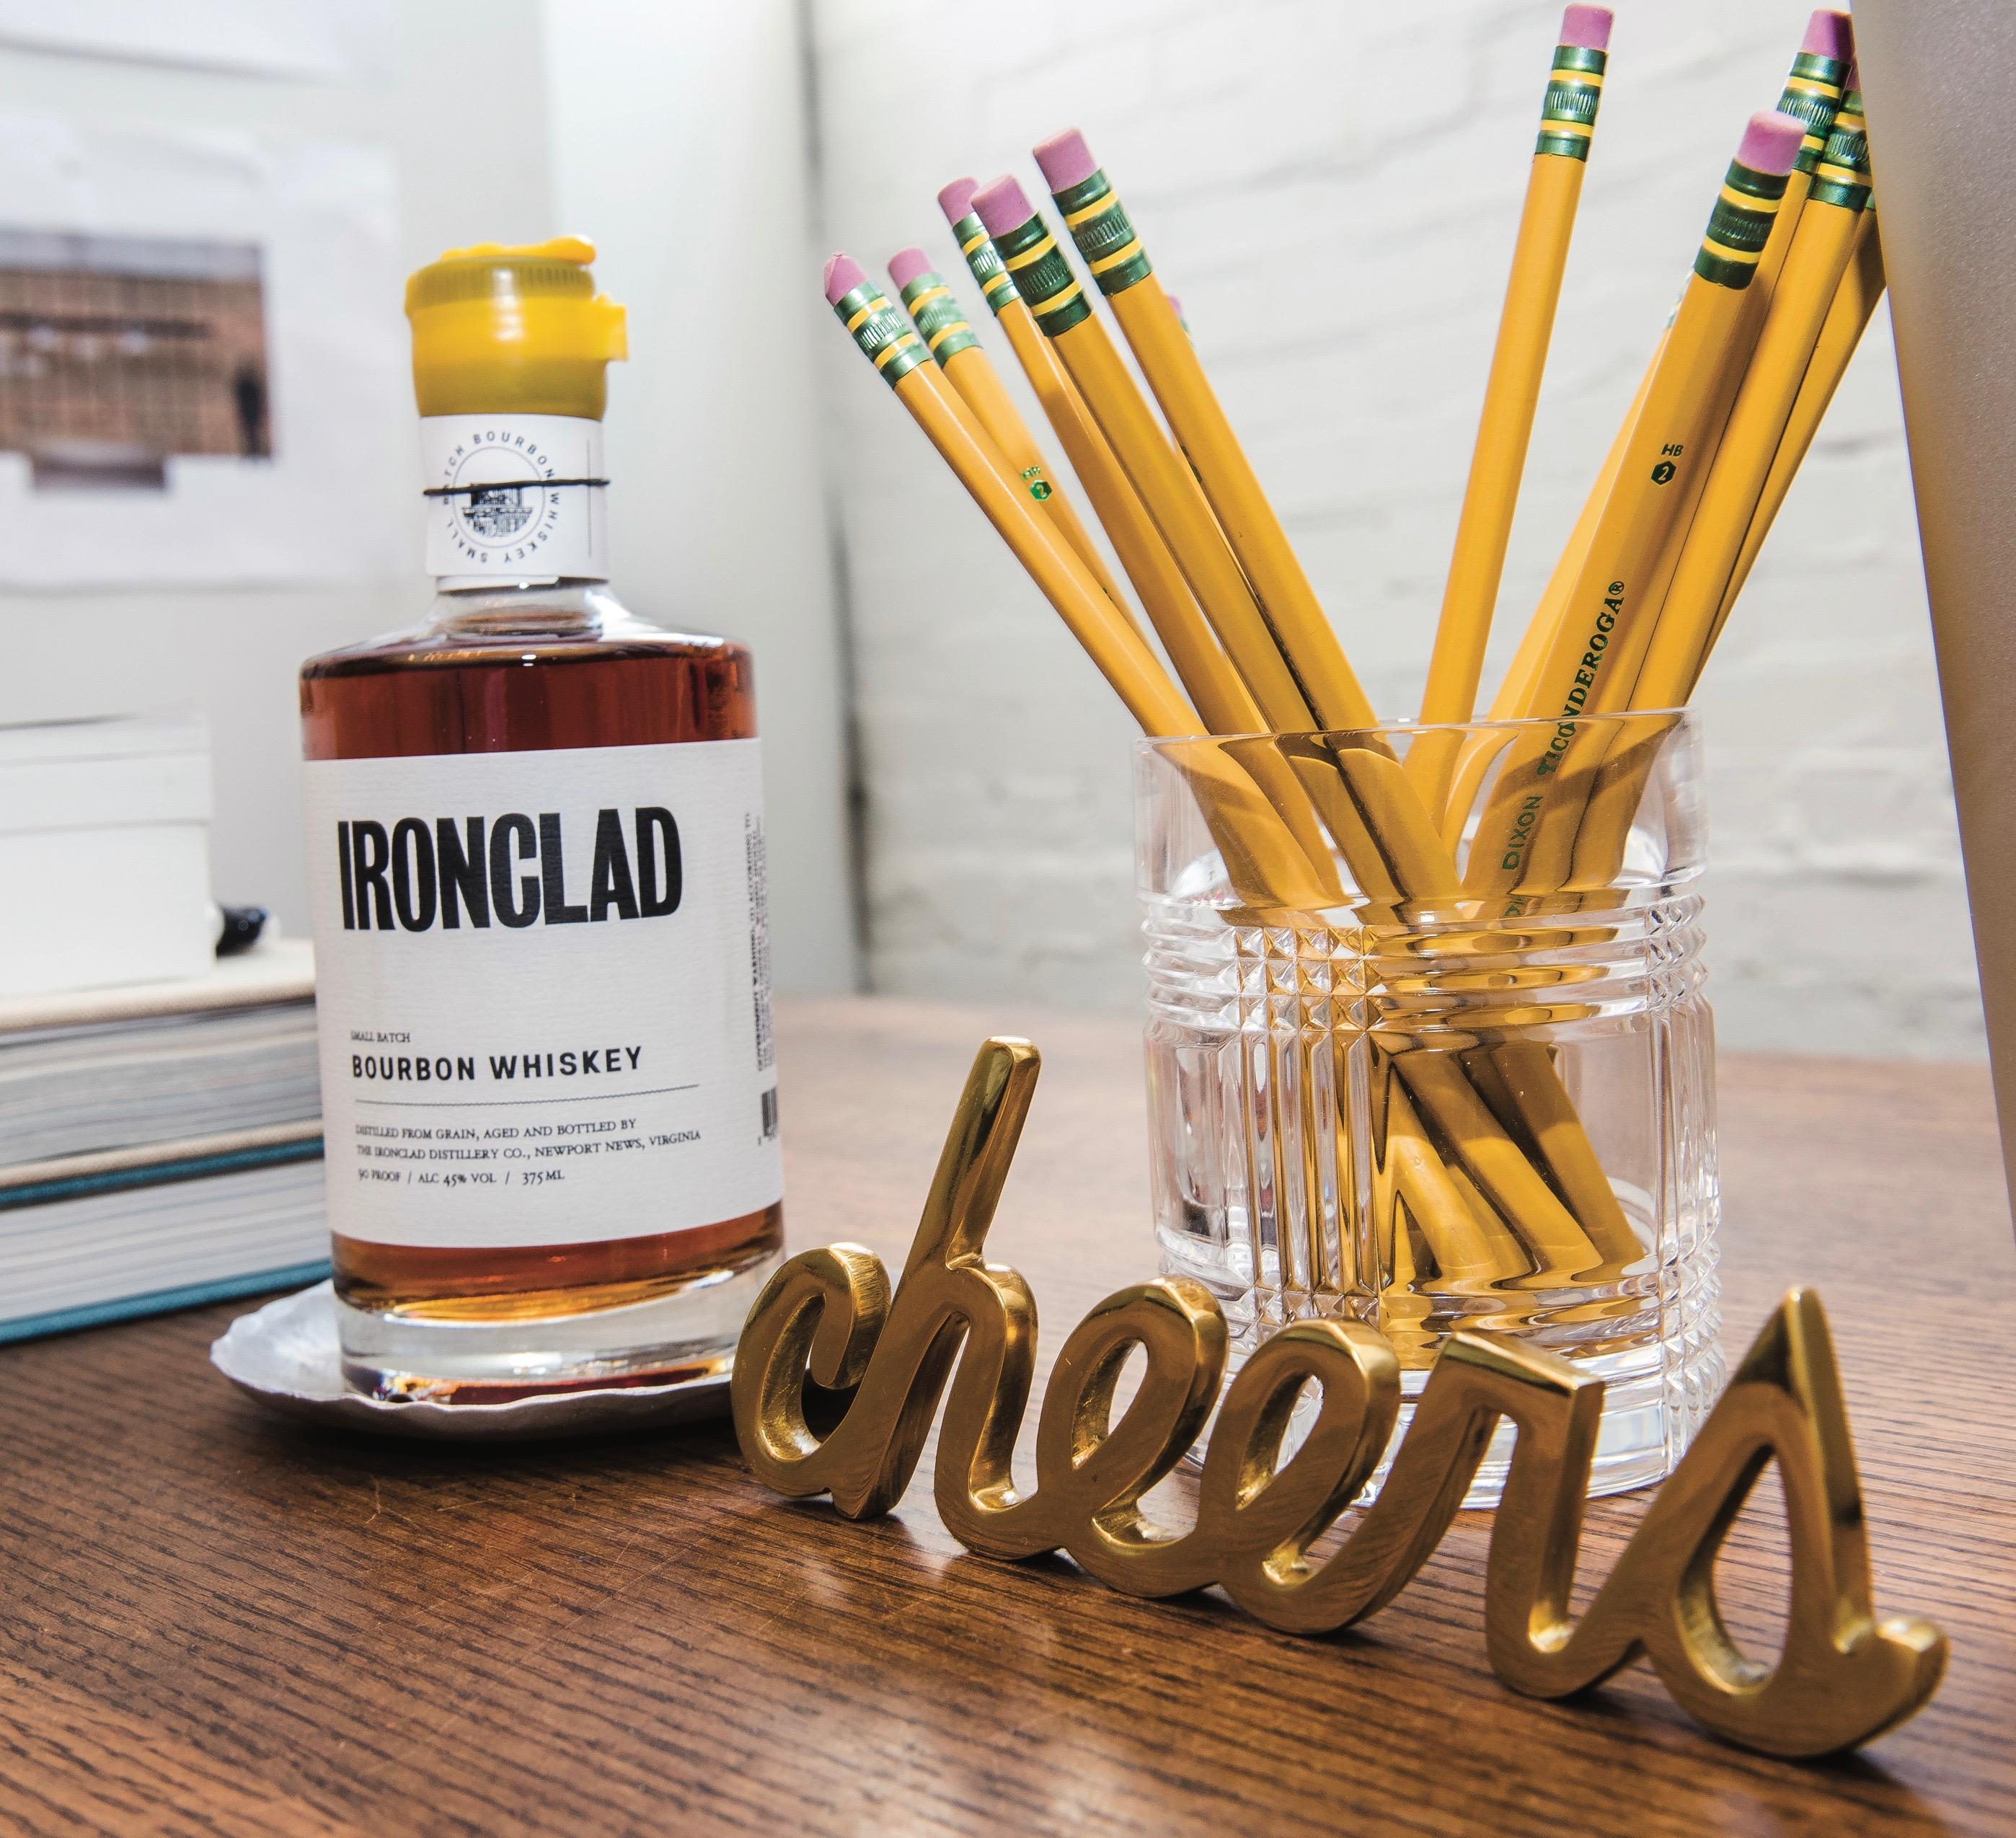 Ironclad Distillery Co., Newport News, Ironclad Bourbon Whiskey